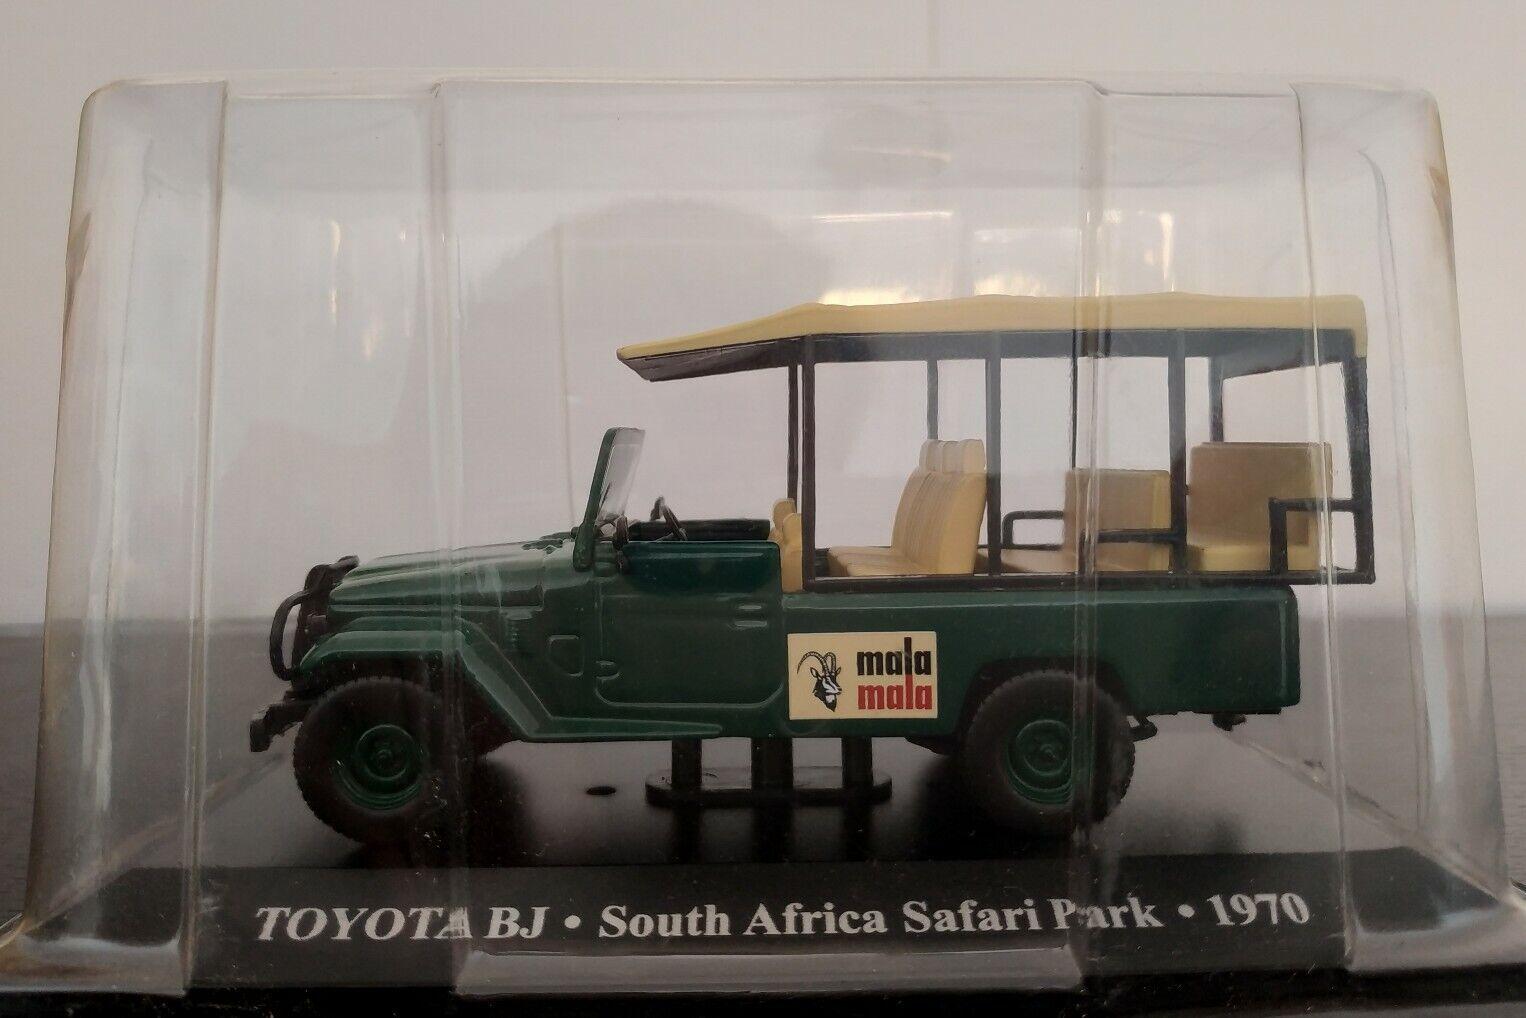 1 43 toyota bj south africa safari park 1970 ixo altaya scale